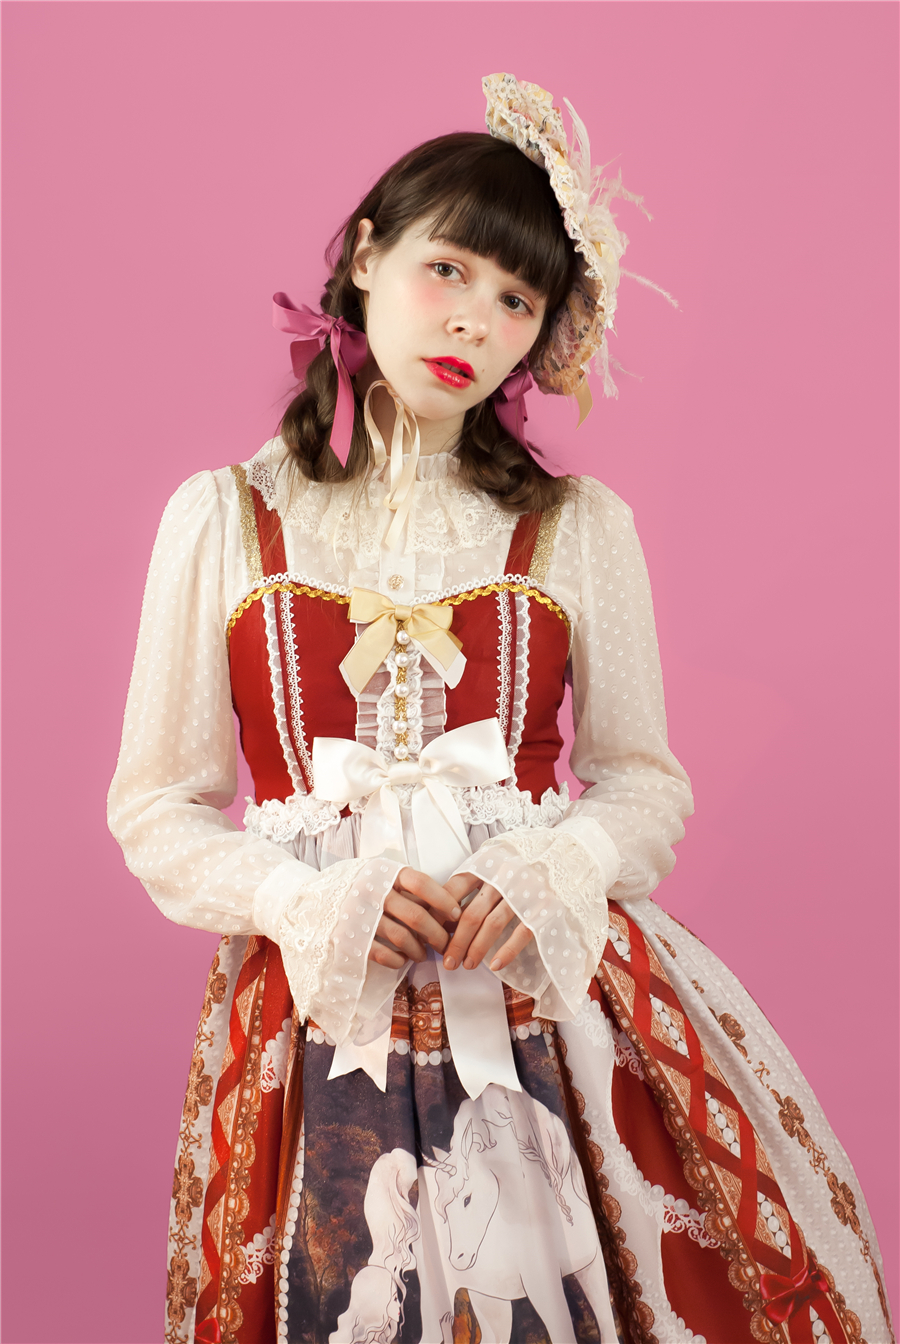 Baby Ponytail_Model Photo_Lacy Rose_White_Claudia_02.jpg